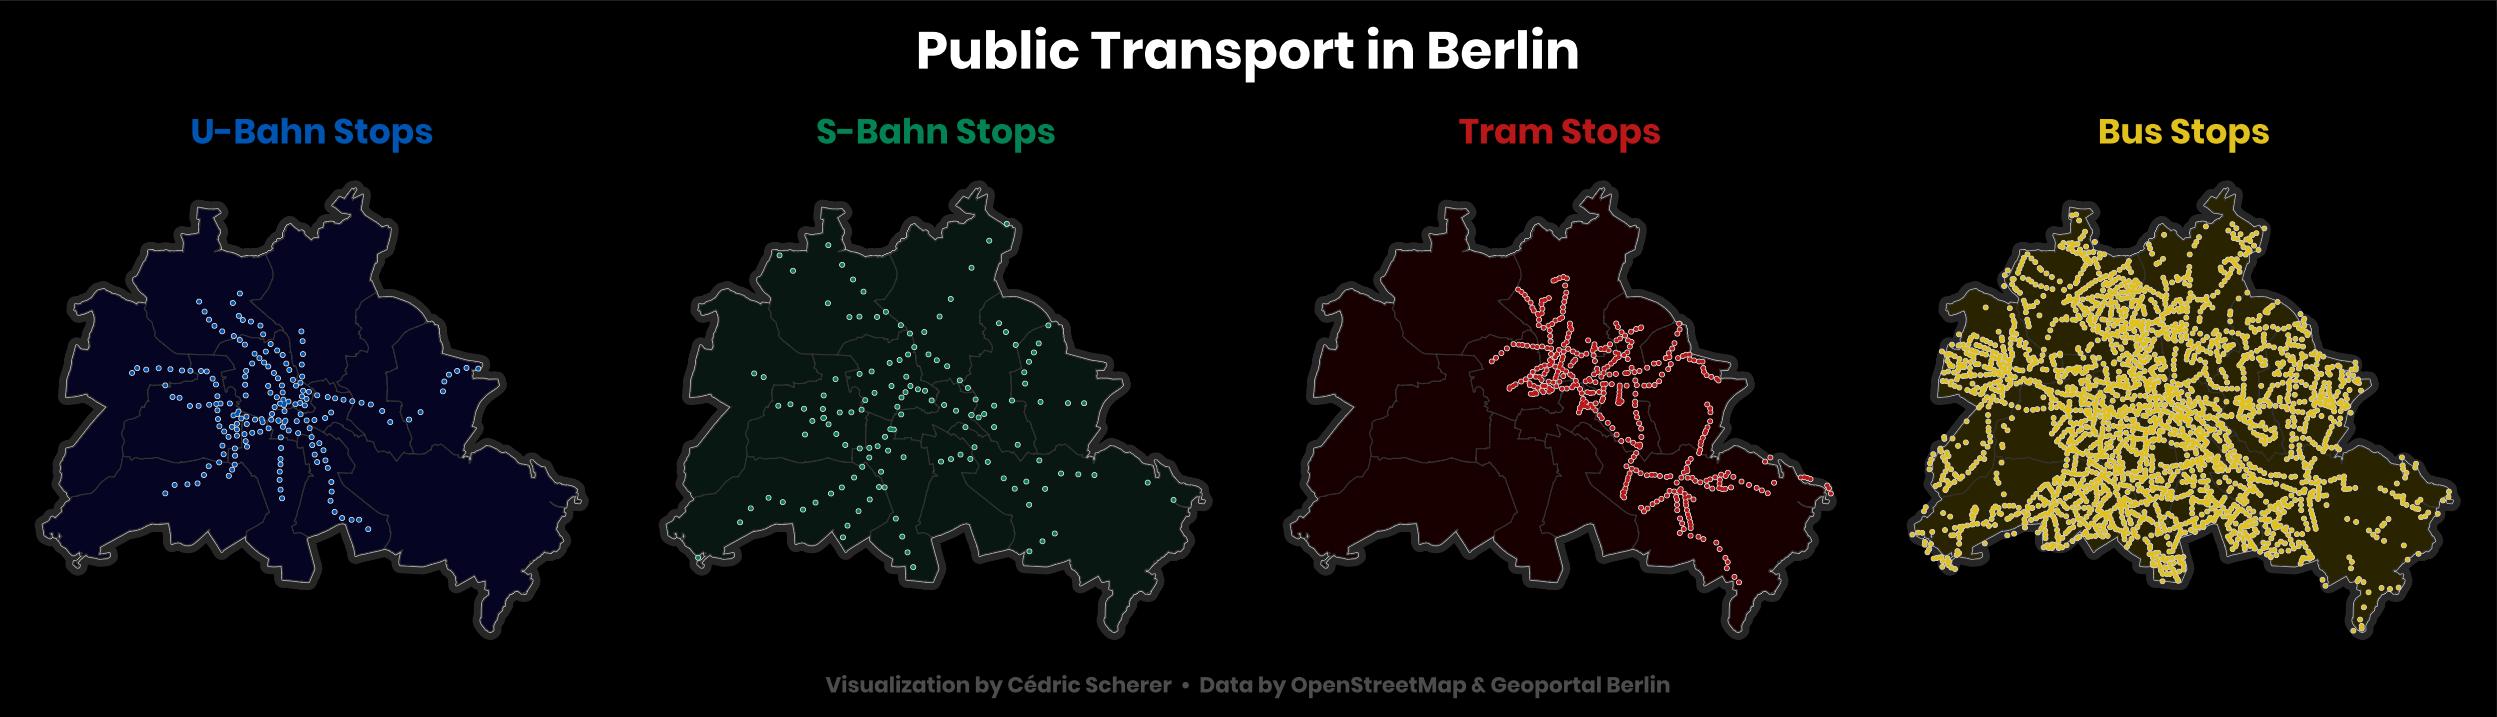 ./Day09_Yellow/BlueRedGreenYellow_BerlinPublicTransport.png